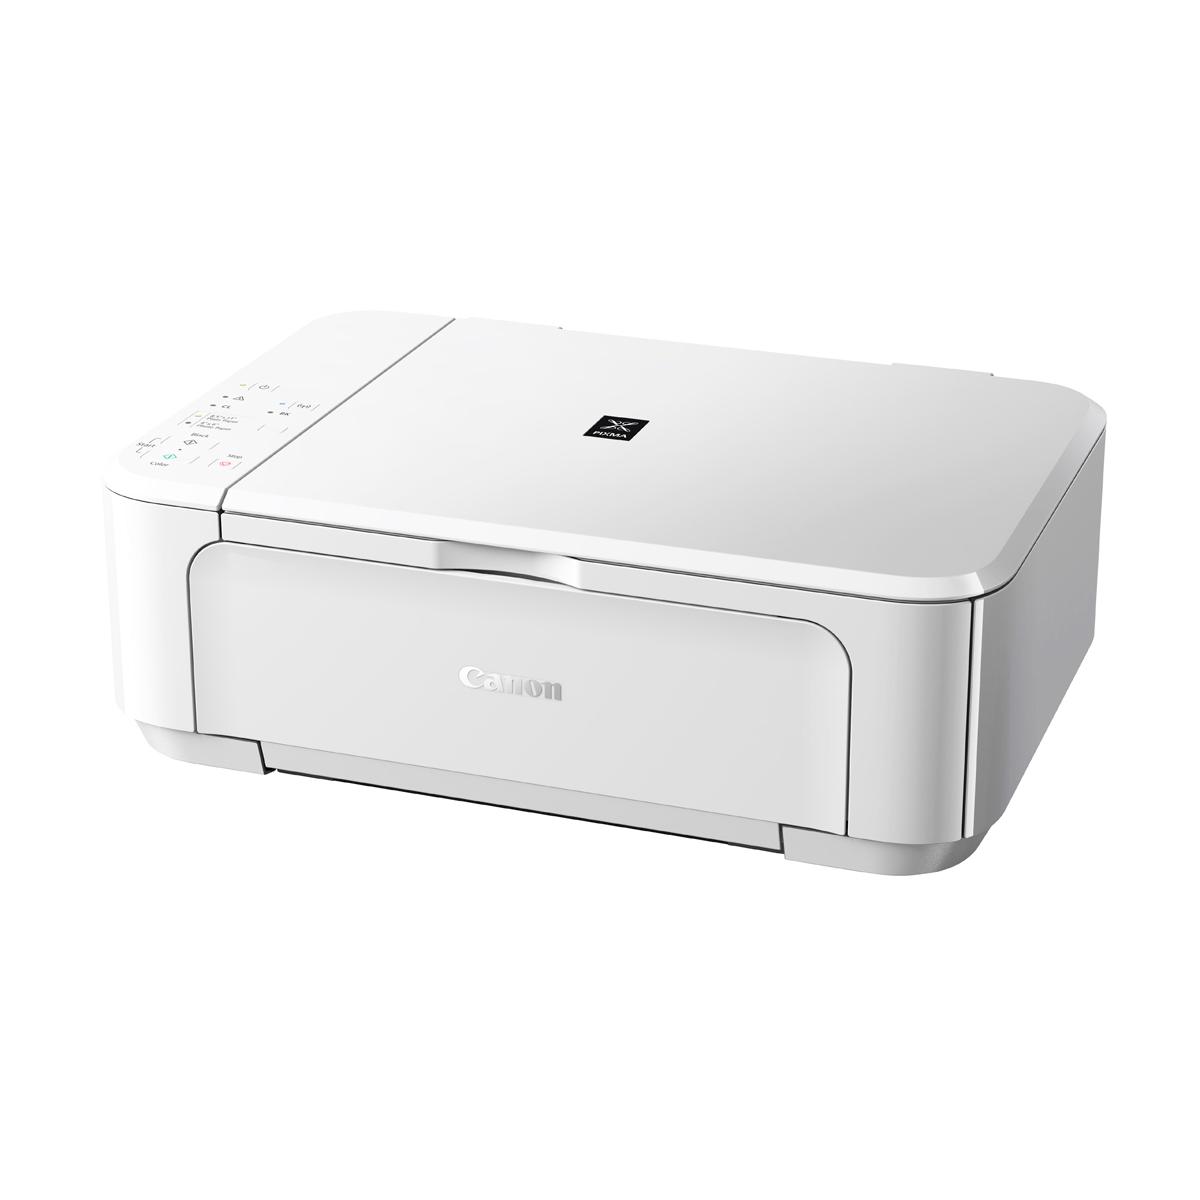 canon pixma mg3550 blanche imprimante multifonction. Black Bedroom Furniture Sets. Home Design Ideas